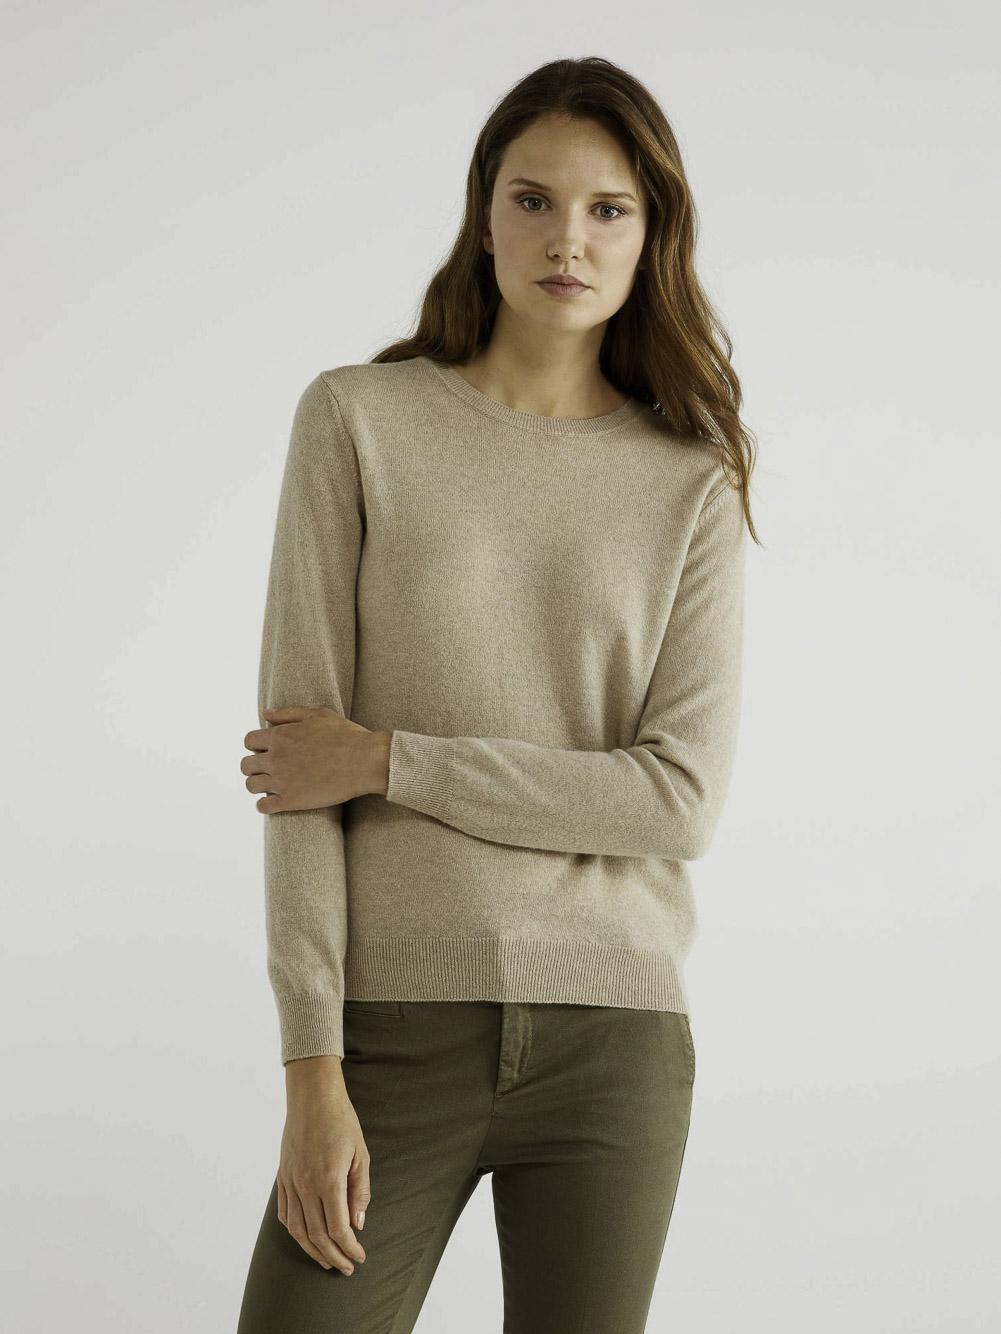 BENETTON Μπλούζα με λαιμόκοψη 100% παρθένο μαλλί 1002D1K01 20A562